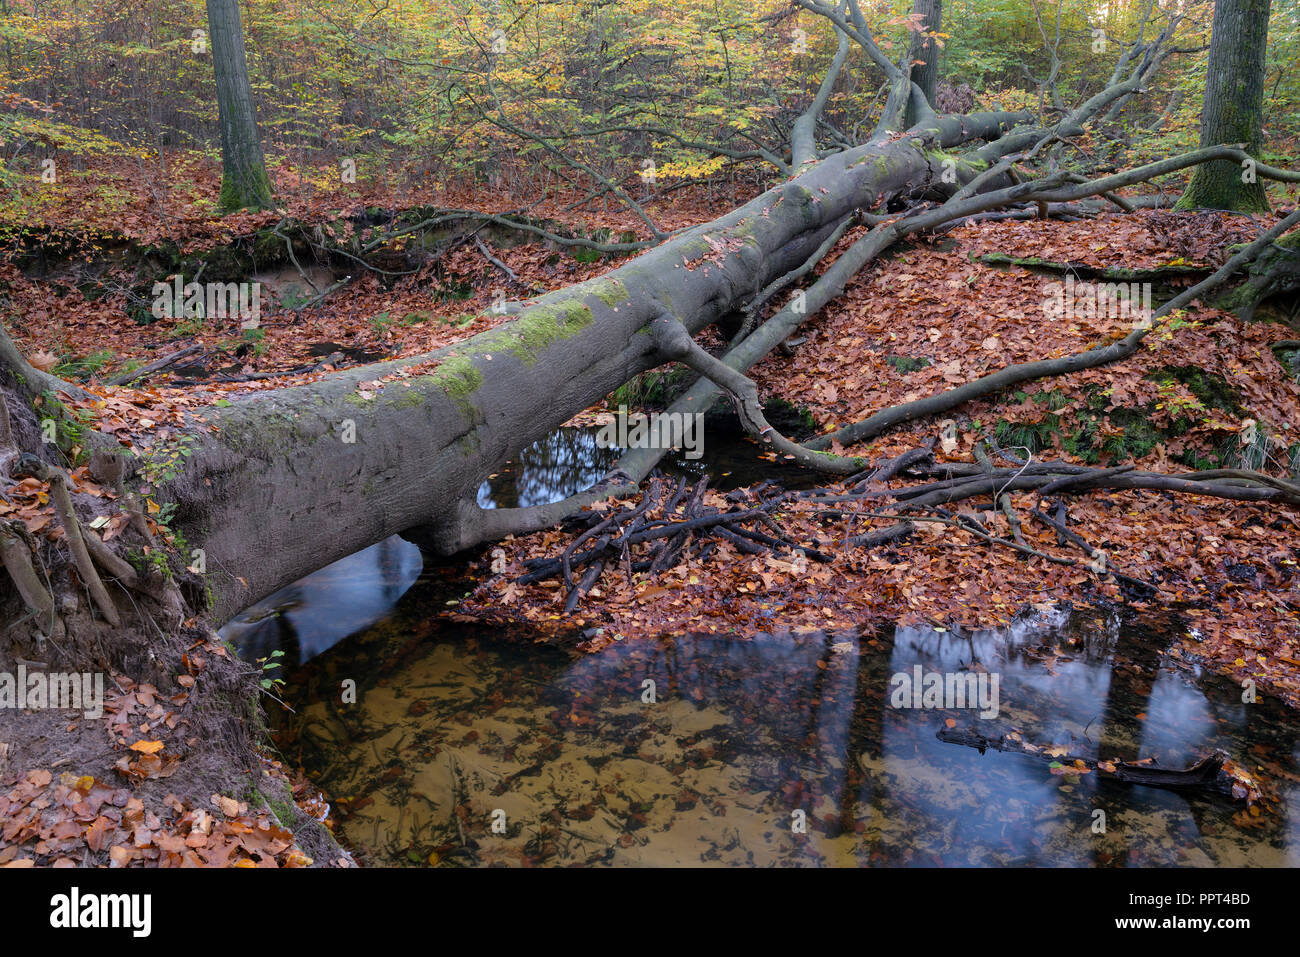 Rotbach, creek in beech forest, november, Oberhausen, Germany Stock Photo